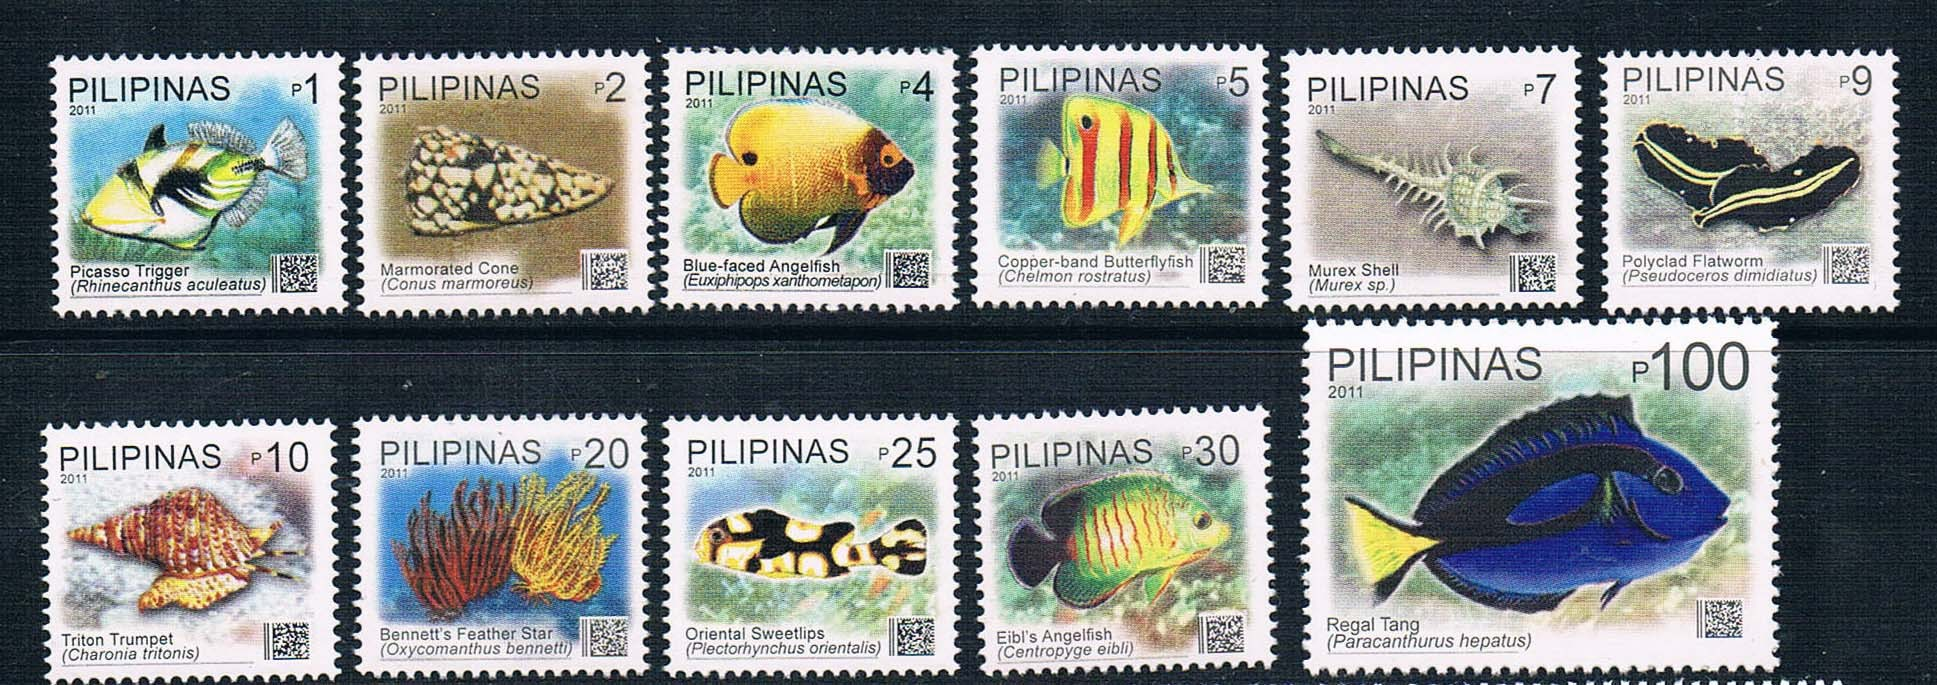 EA1580 Philippines 2012 marine general ticket 11 new 0916 Edition ea ac87